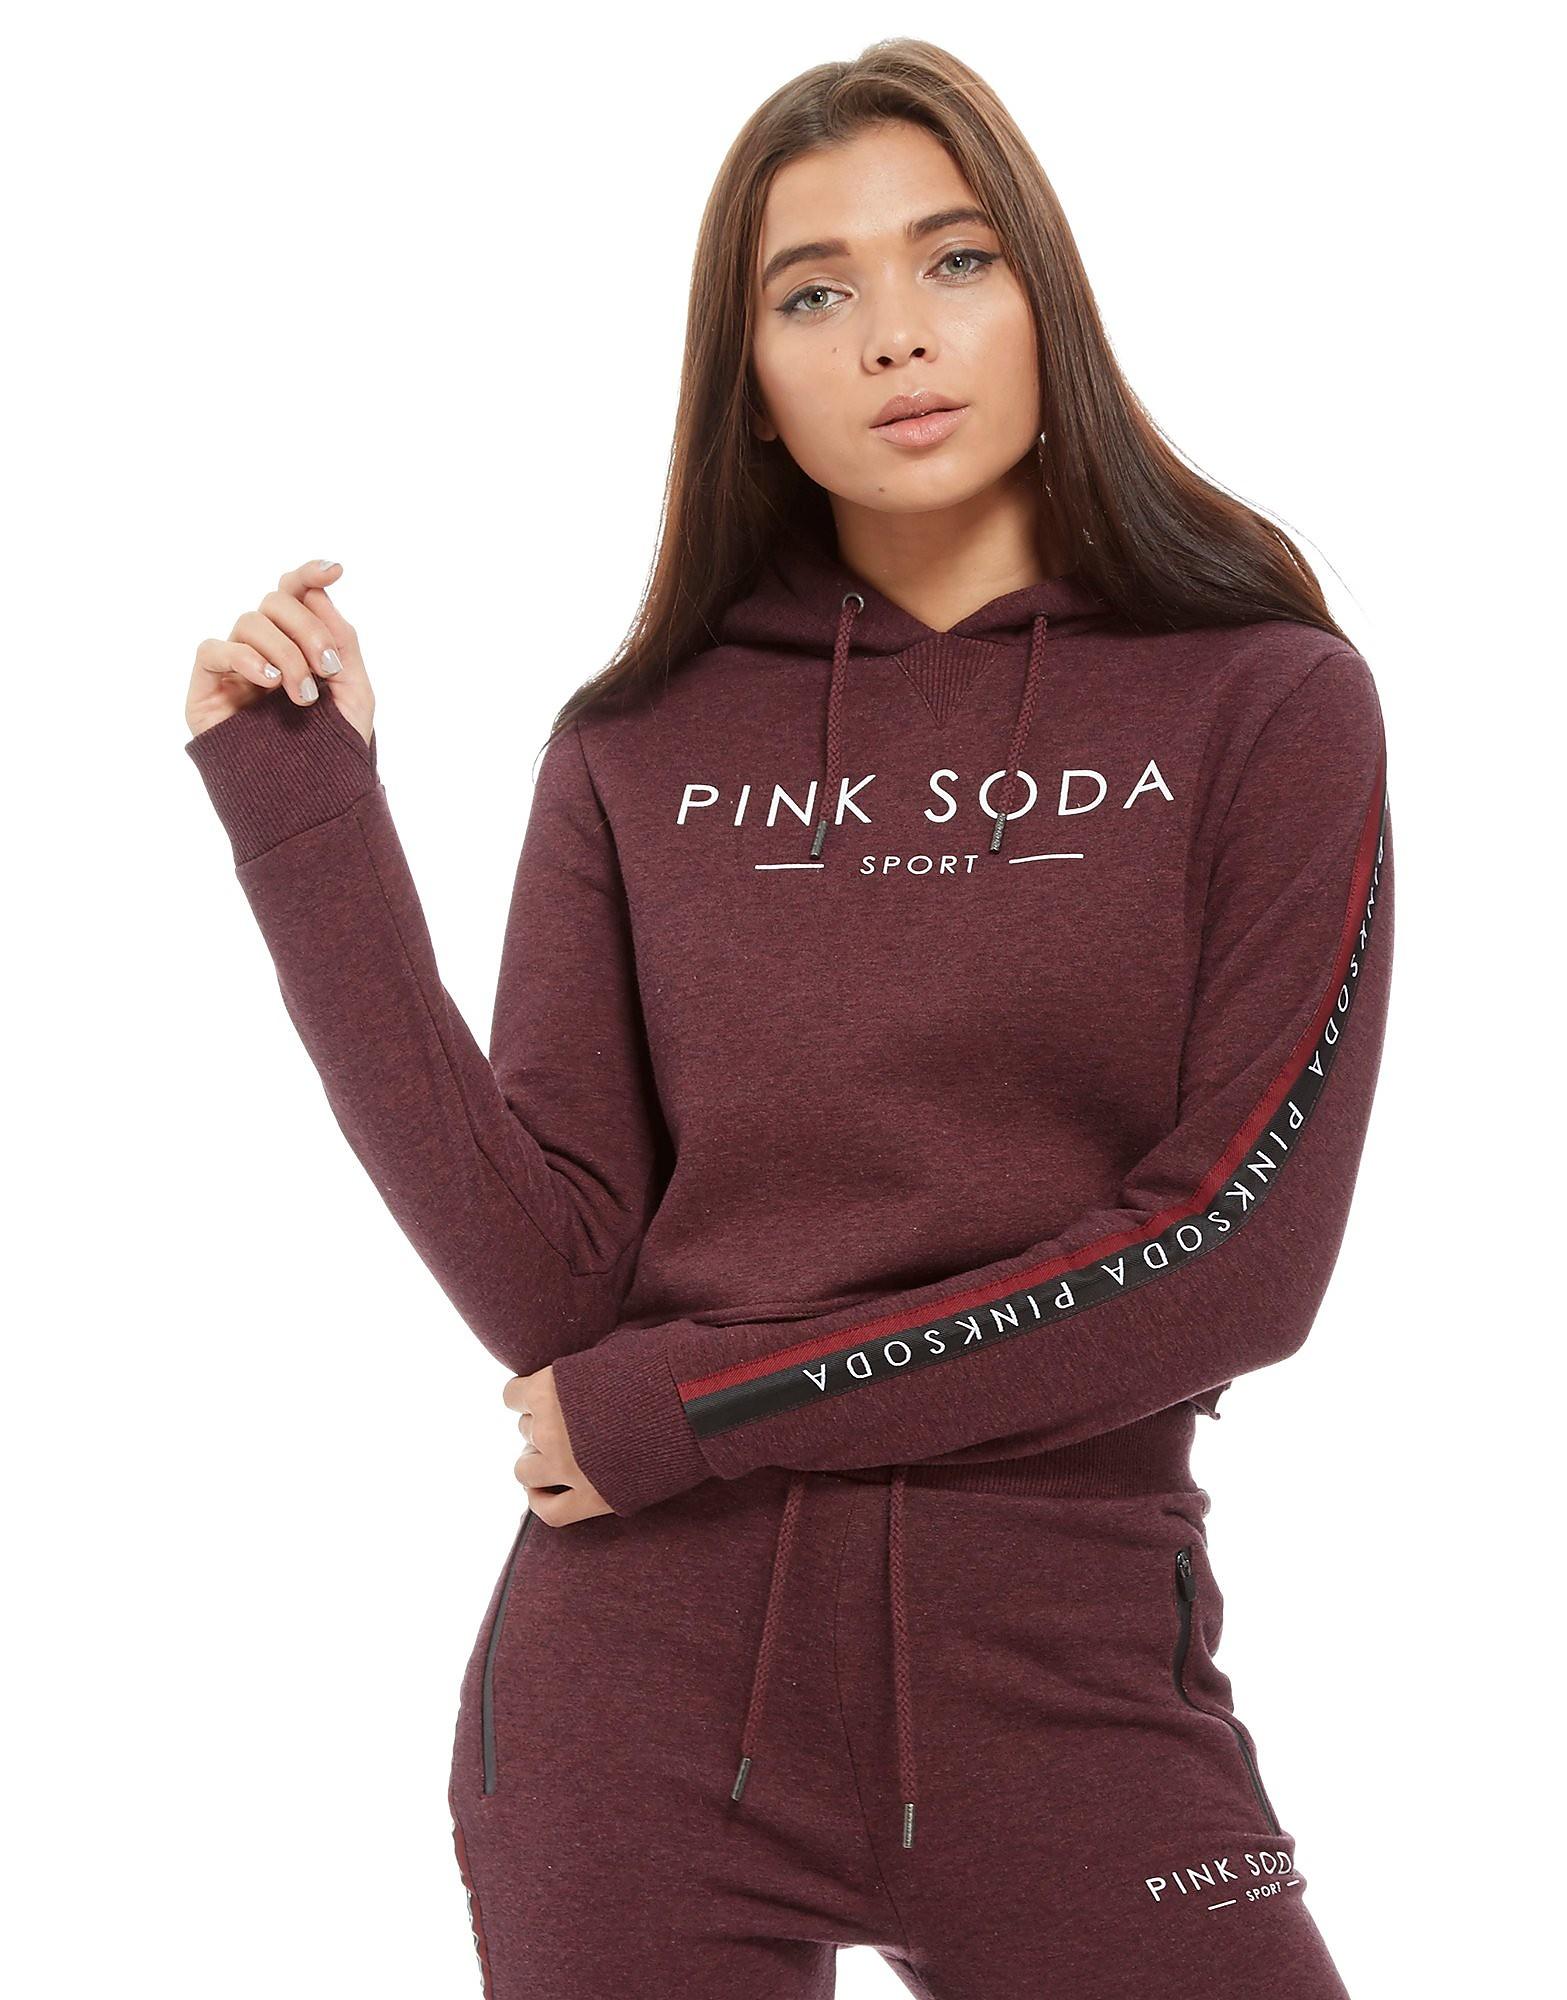 Pink Soda Sport Cropped Overhead Hoody